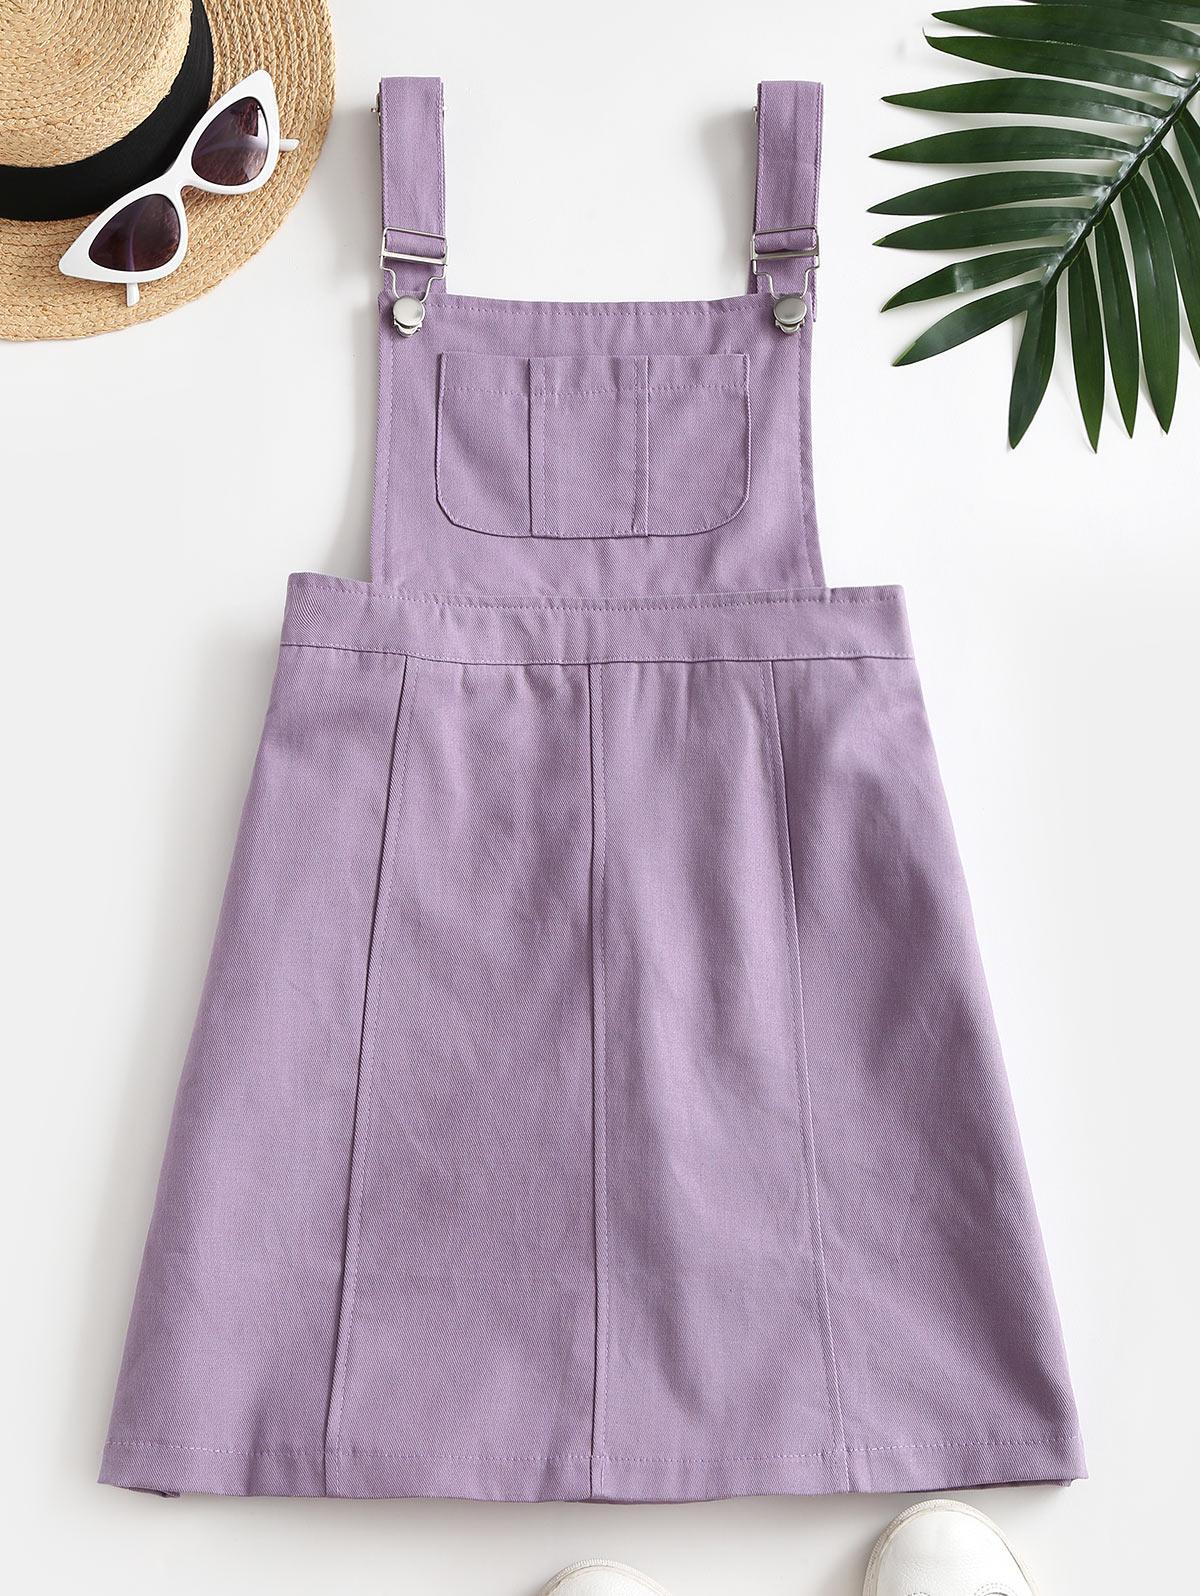 Casual Pockets Overalls Mini Dress